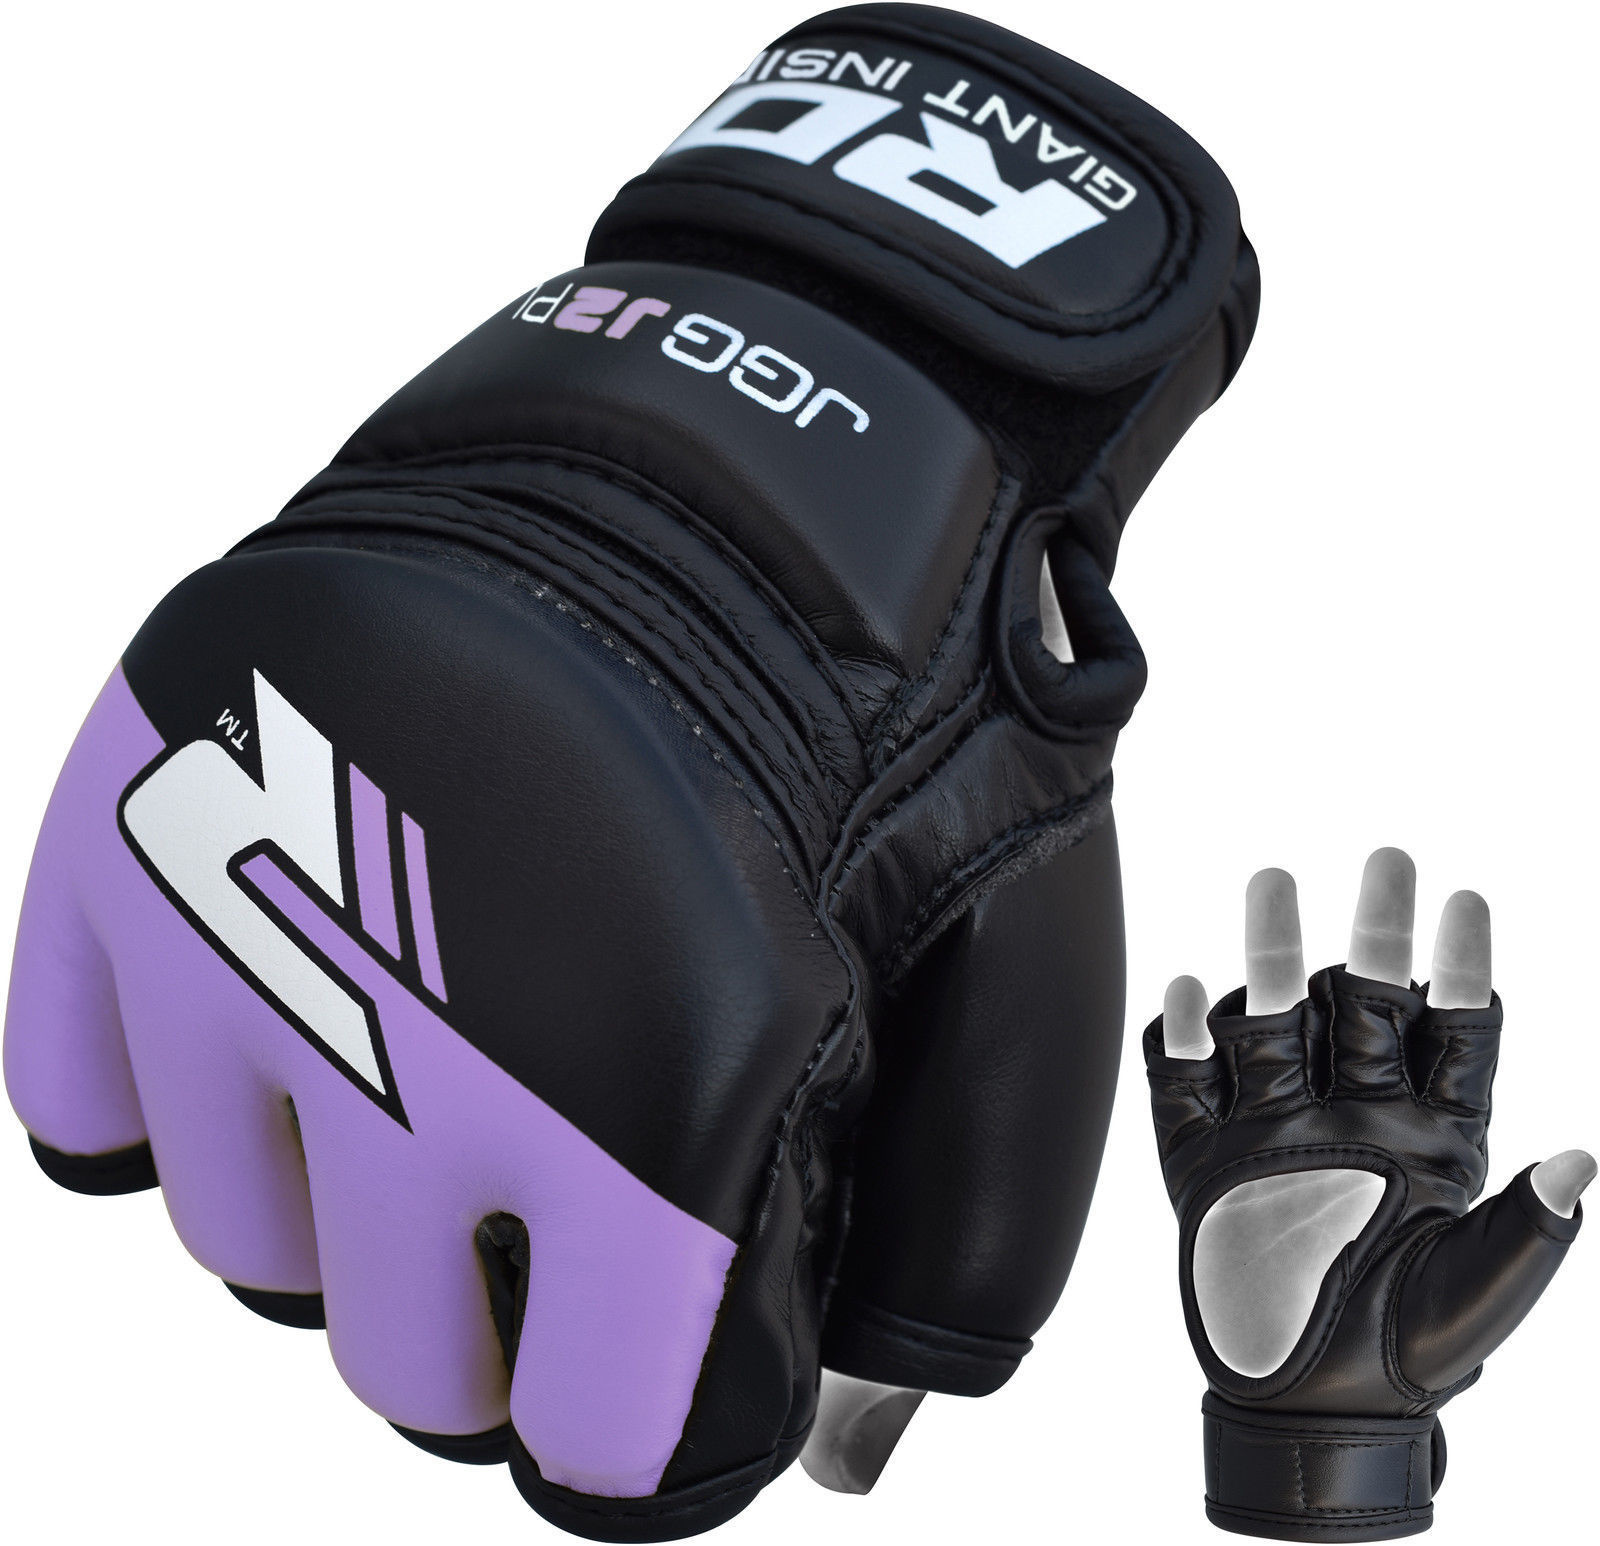 RDX Grappling Gloves Kids - Zwart met groen-538689